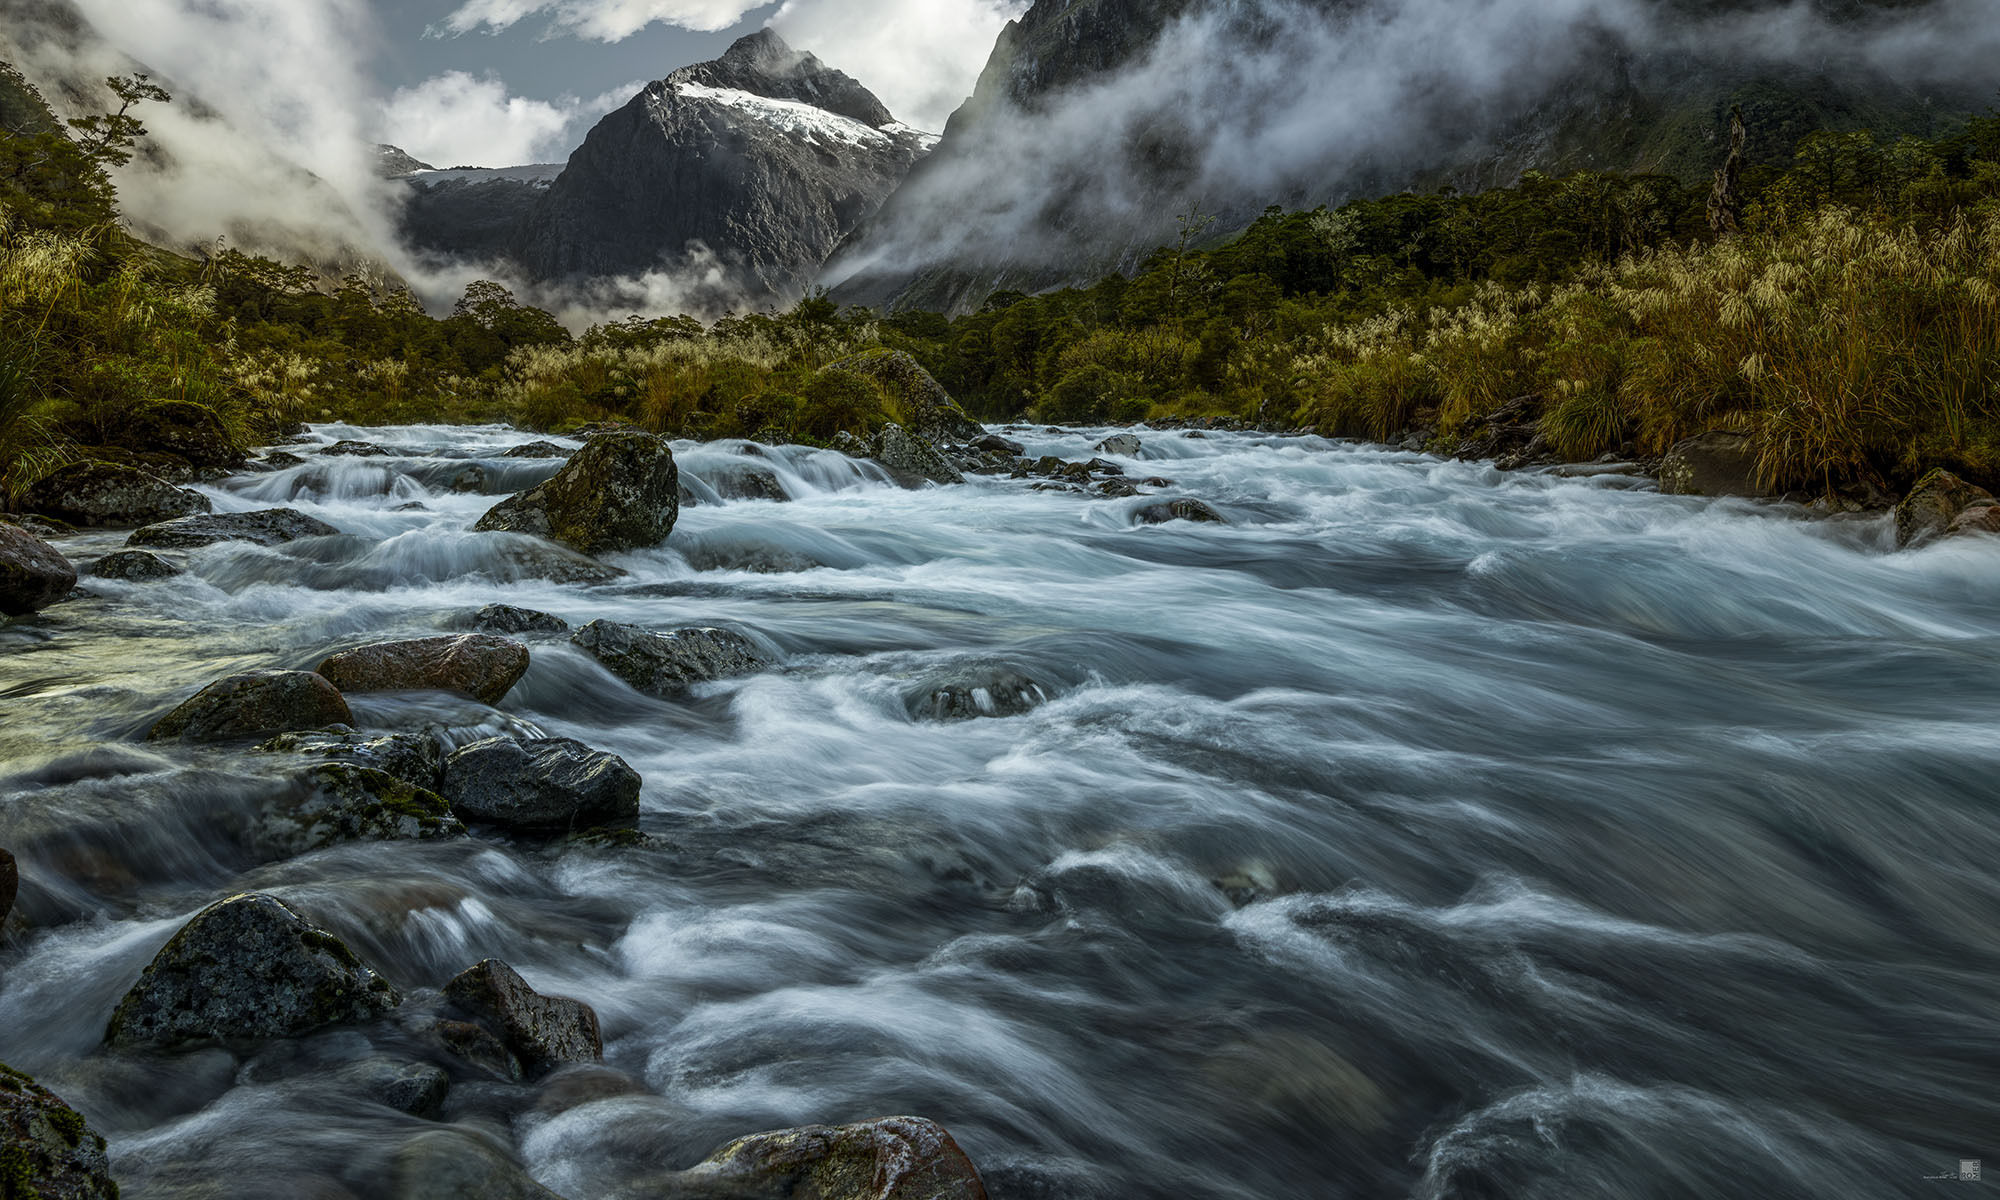 Hollywood River by Stephan Romer